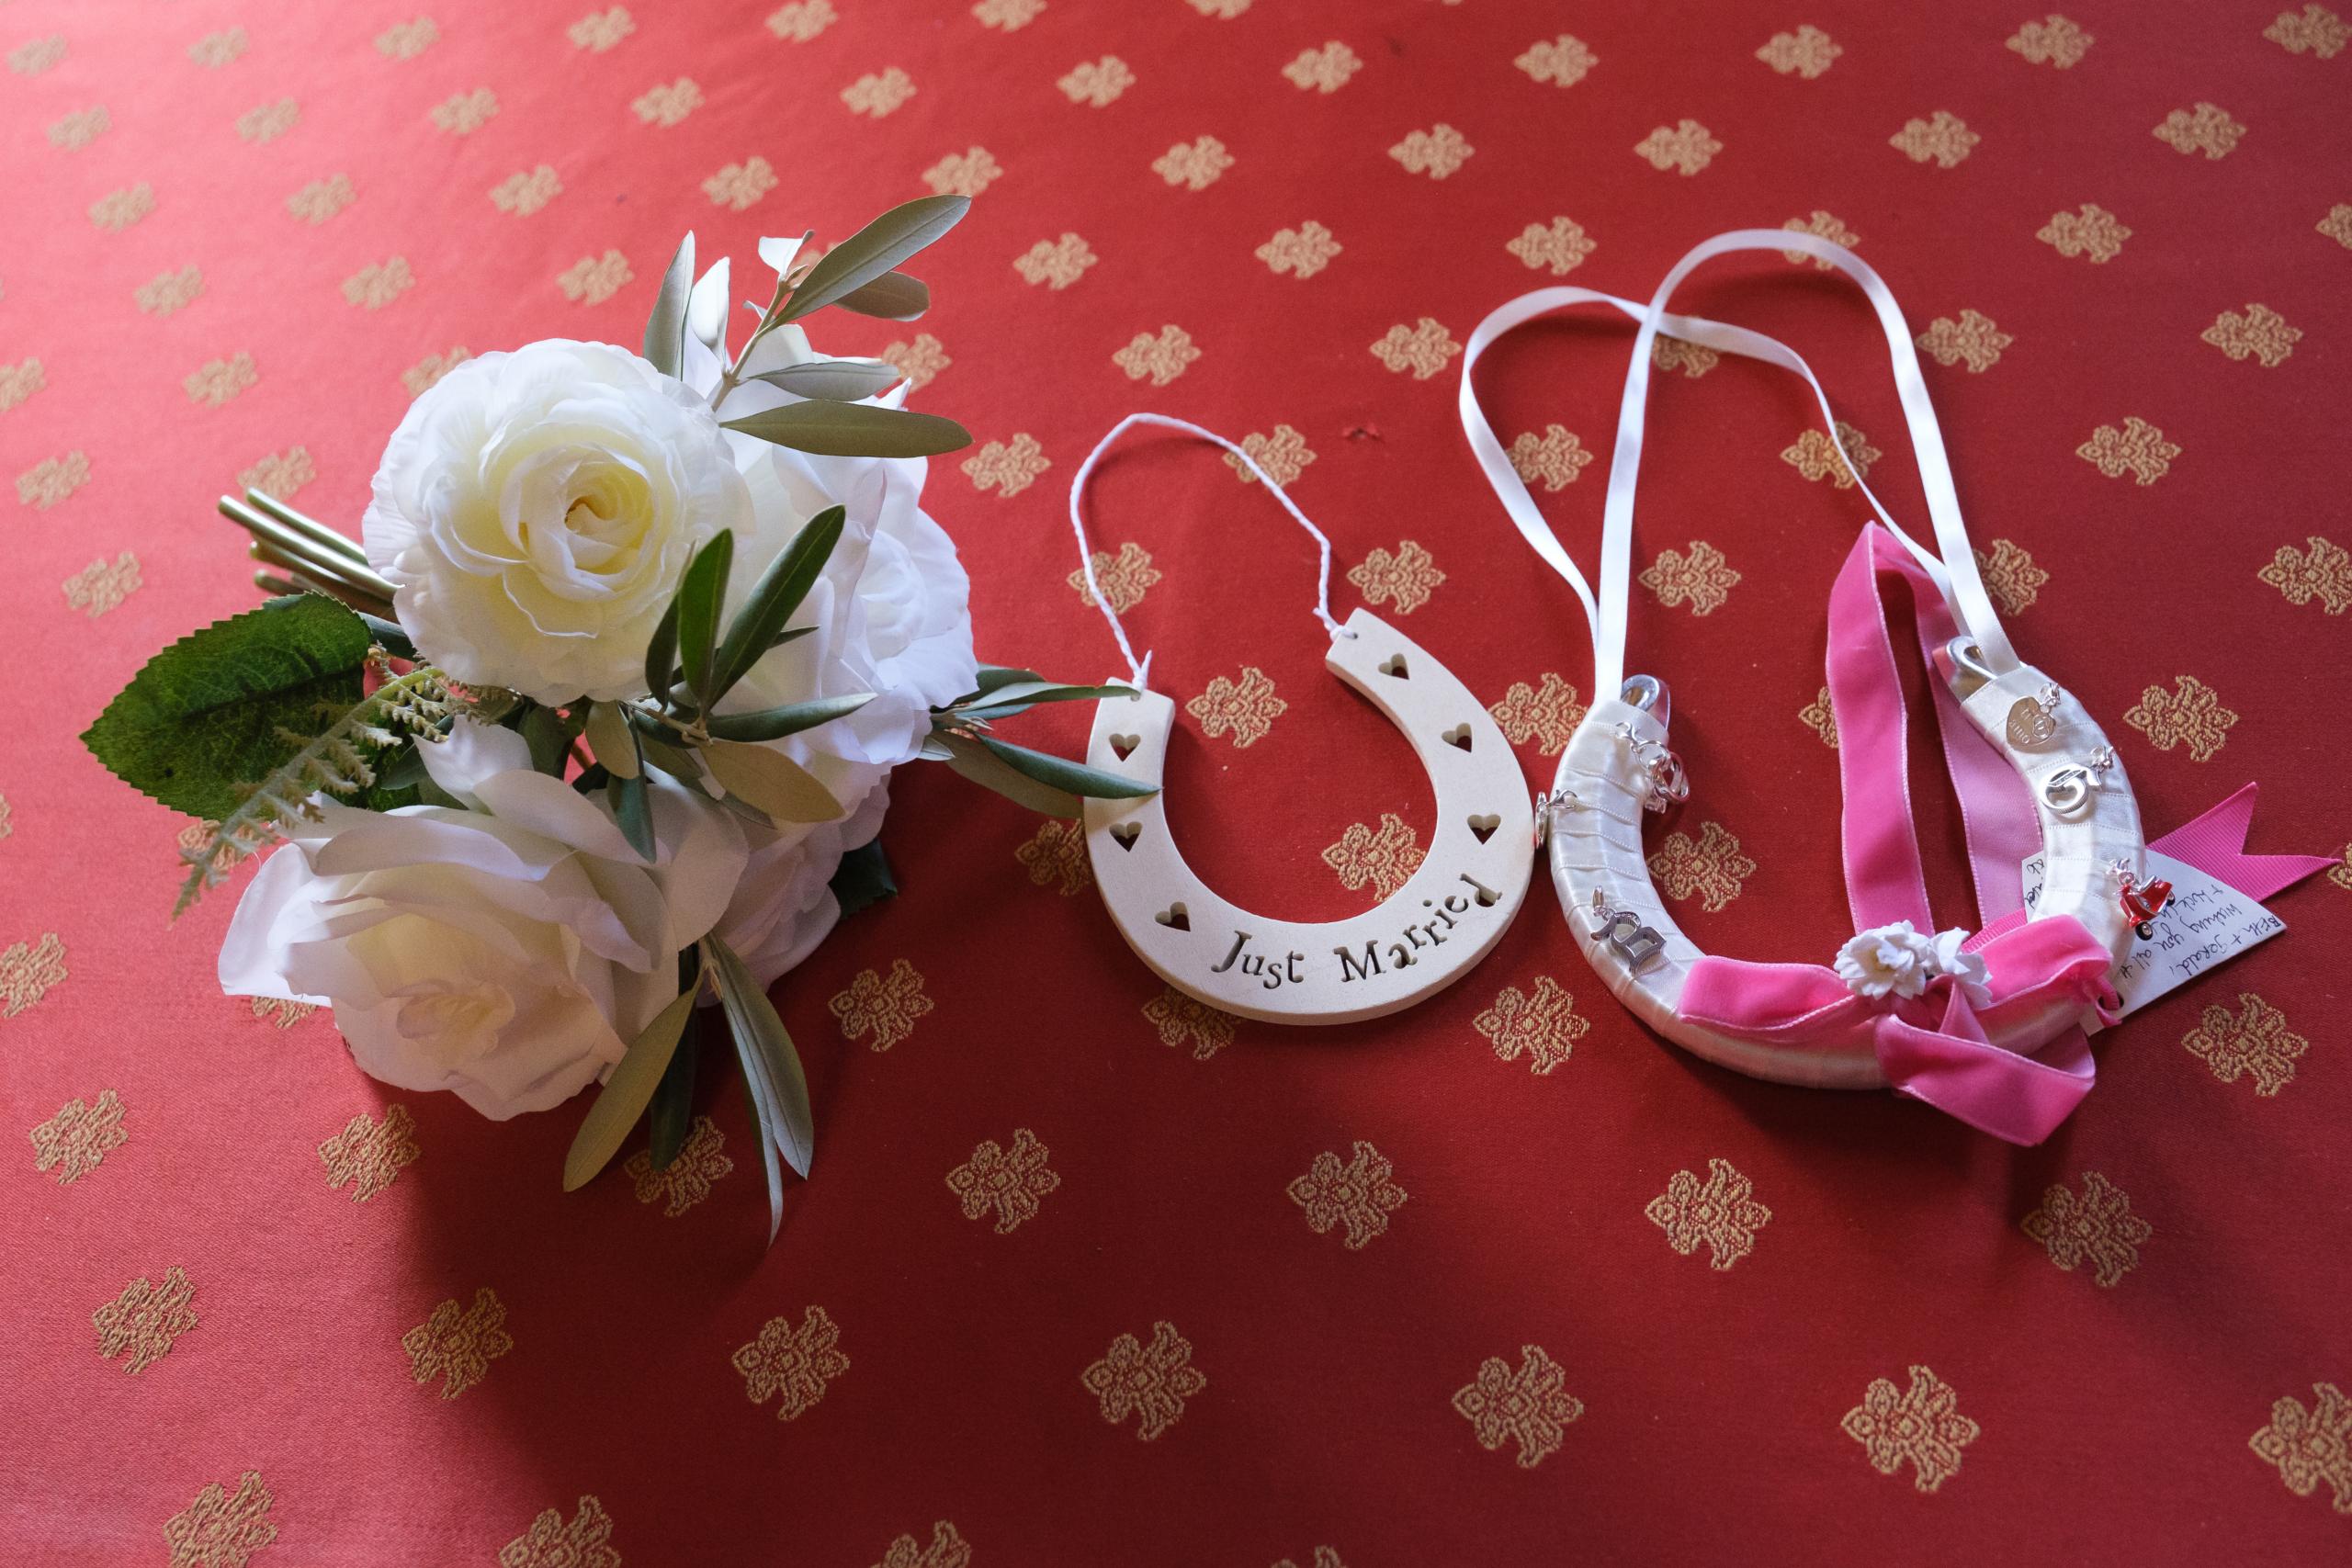 wedding, Rome, luxuriwedding, Elopewedding, Elopement, Tivoli, Bracciano, love, Friends, Cake, weddingcake